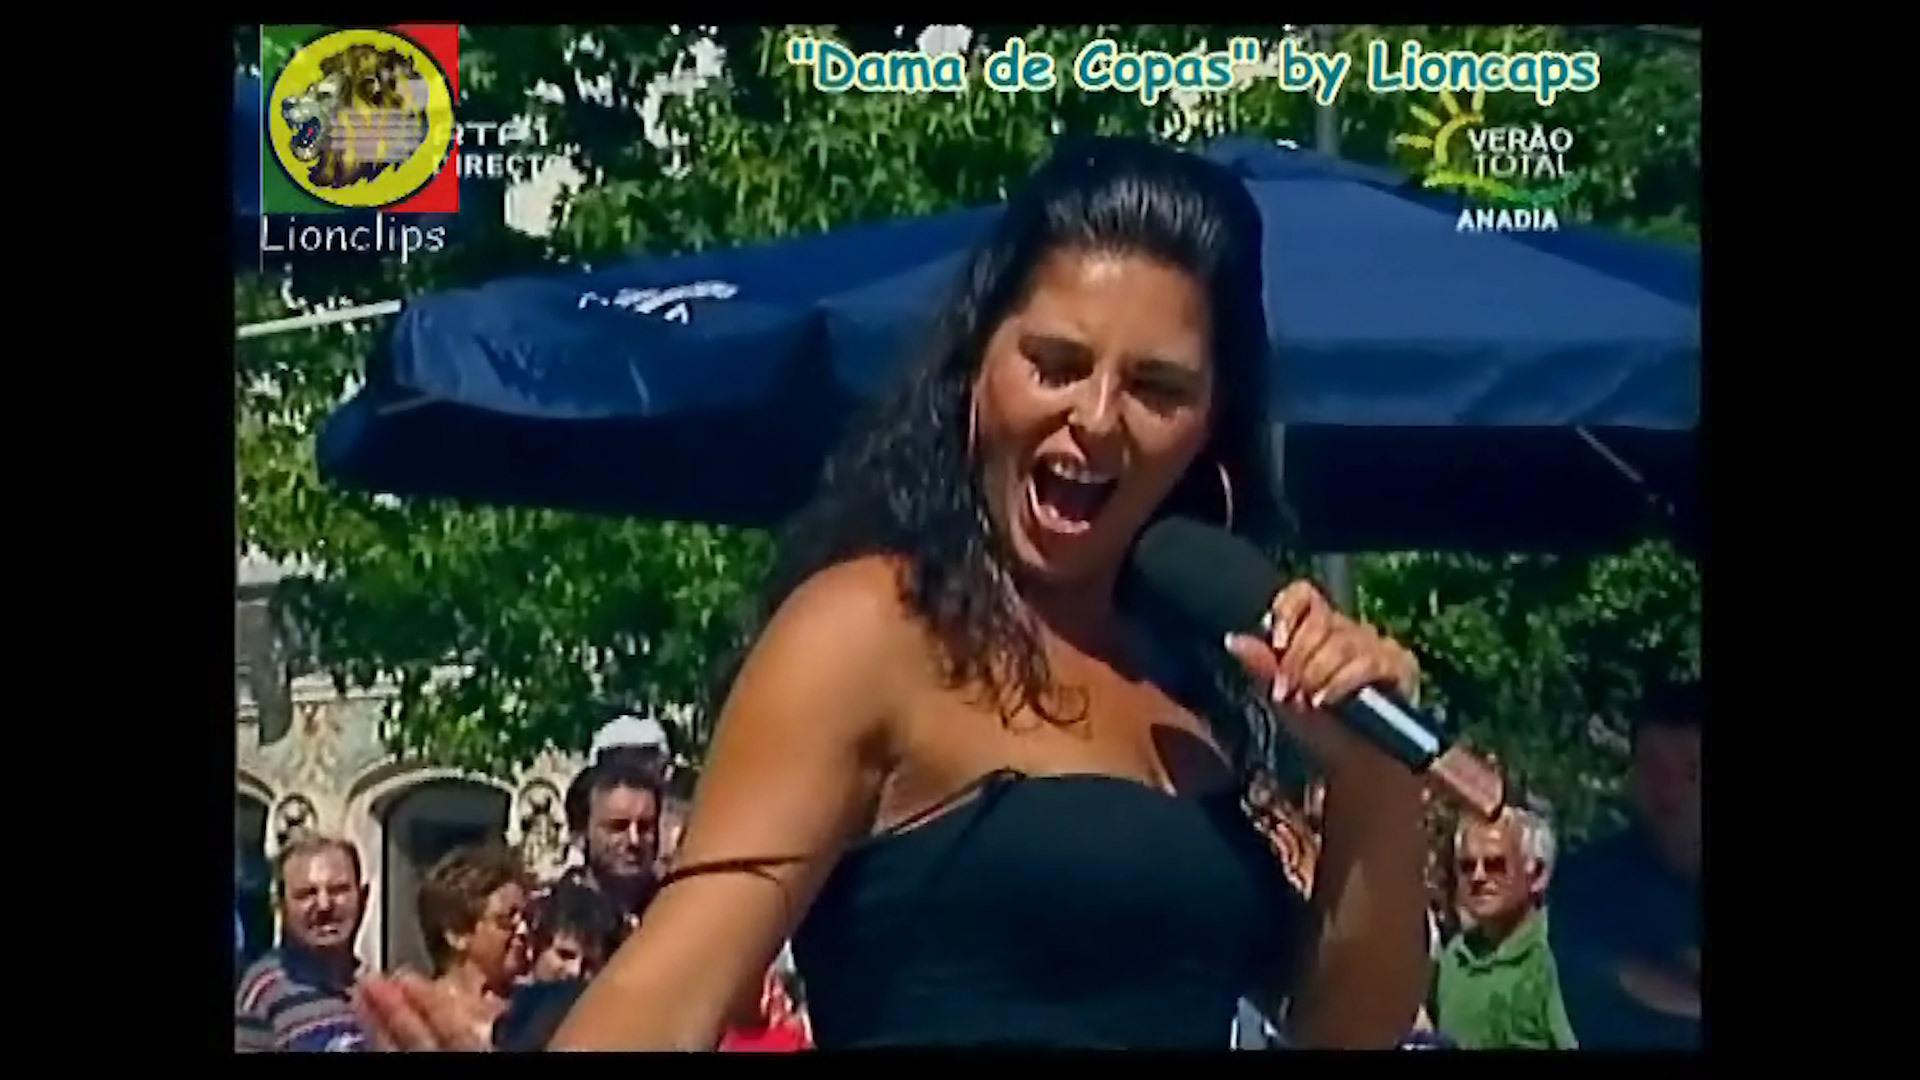 bestoff_portugal_d02_lioncaps_03_06_2021 (3).jpg